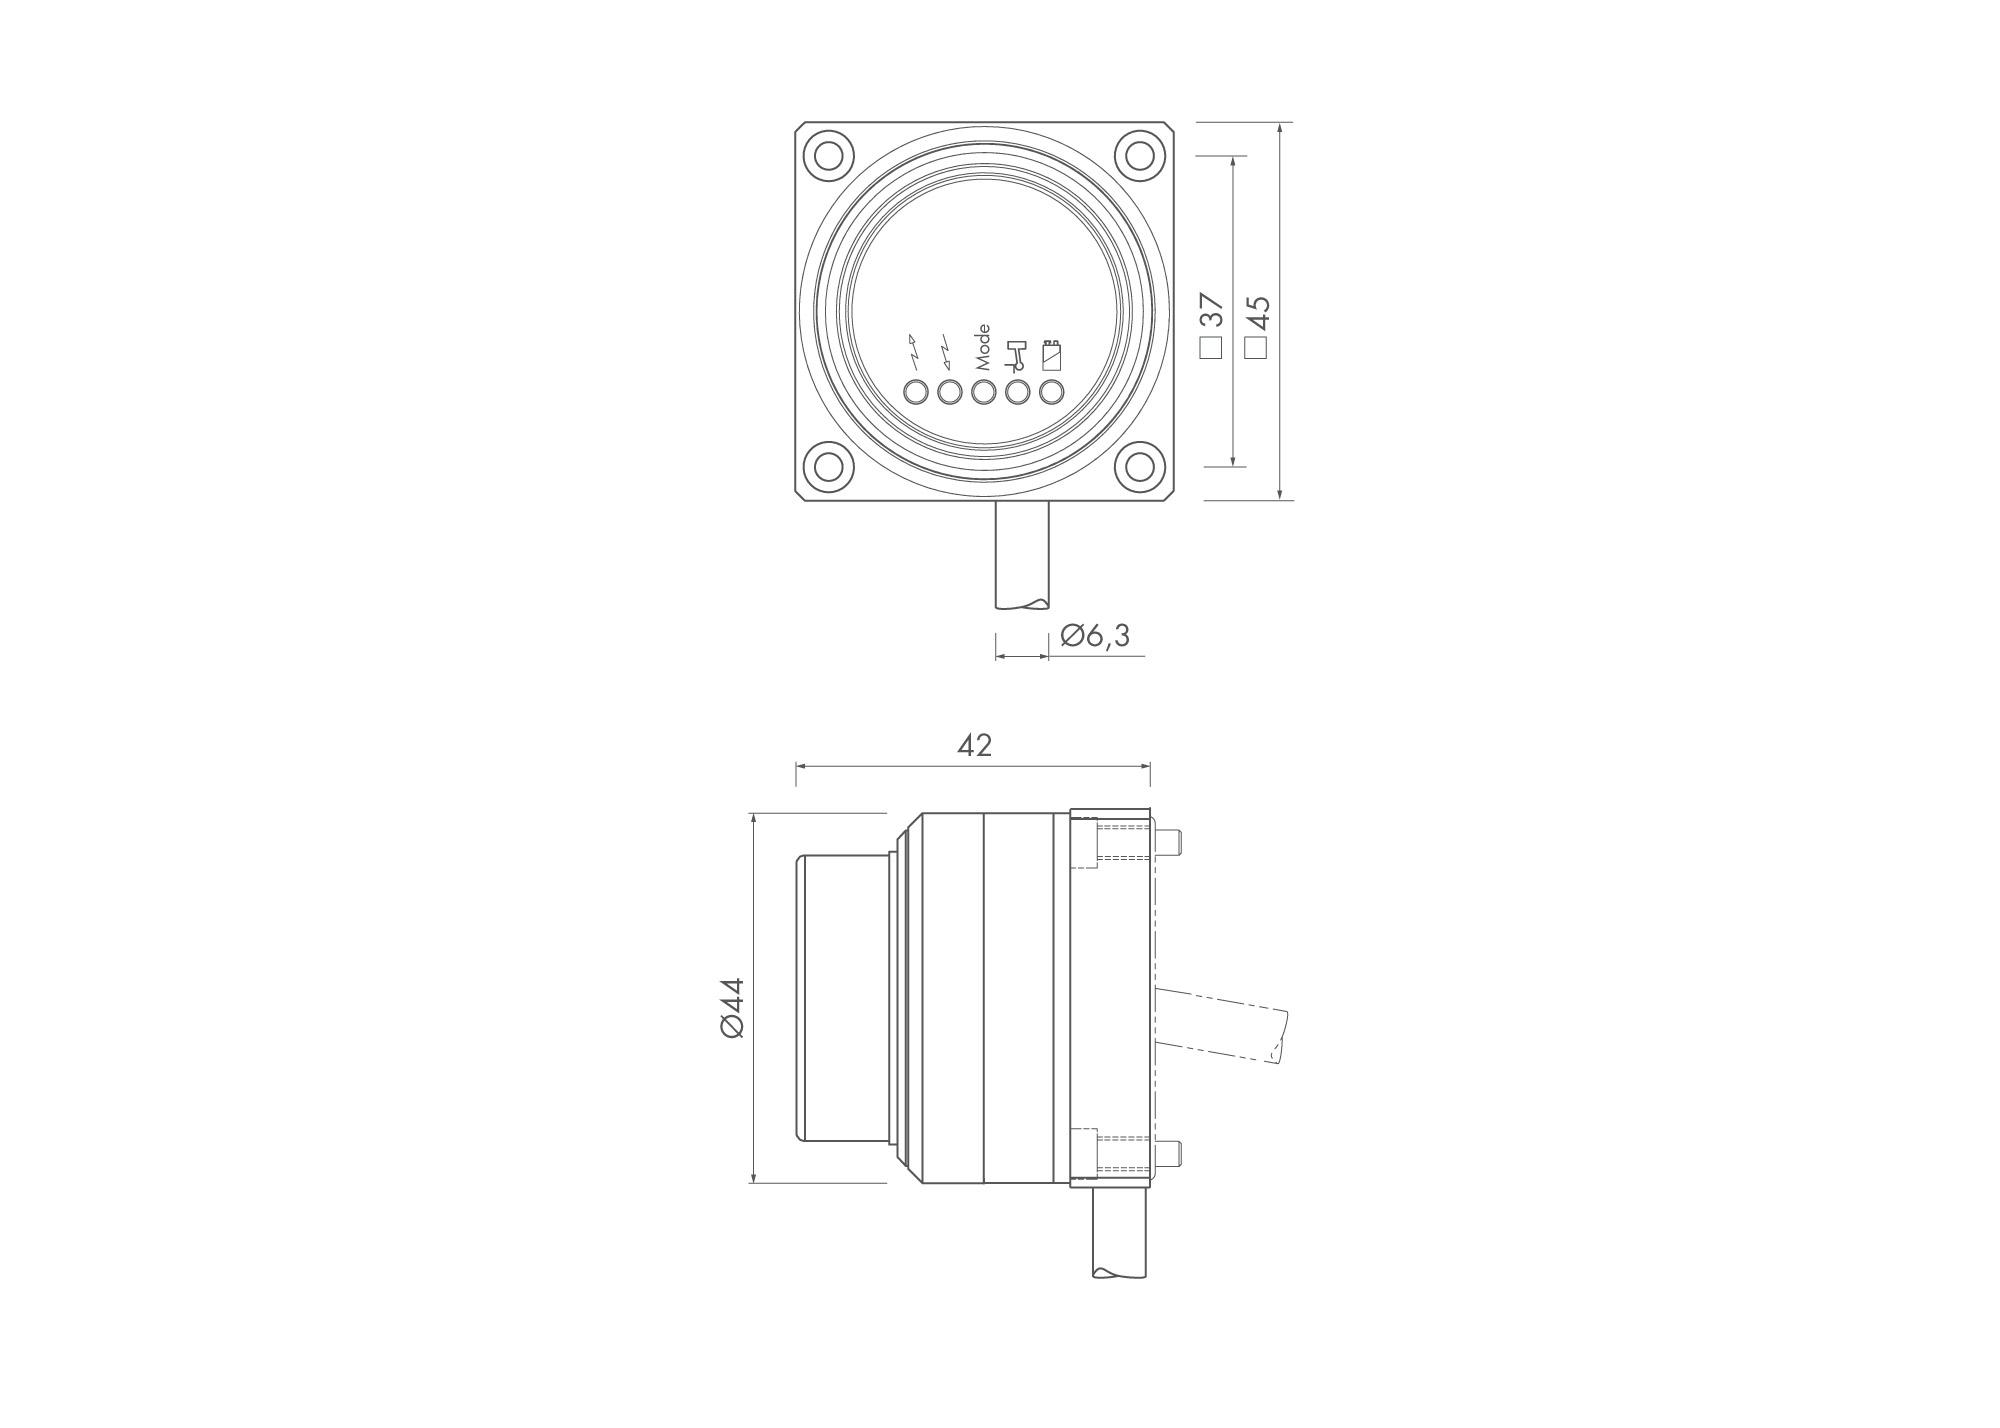 50389 tc62 workpiece touch probe receiver dimensions